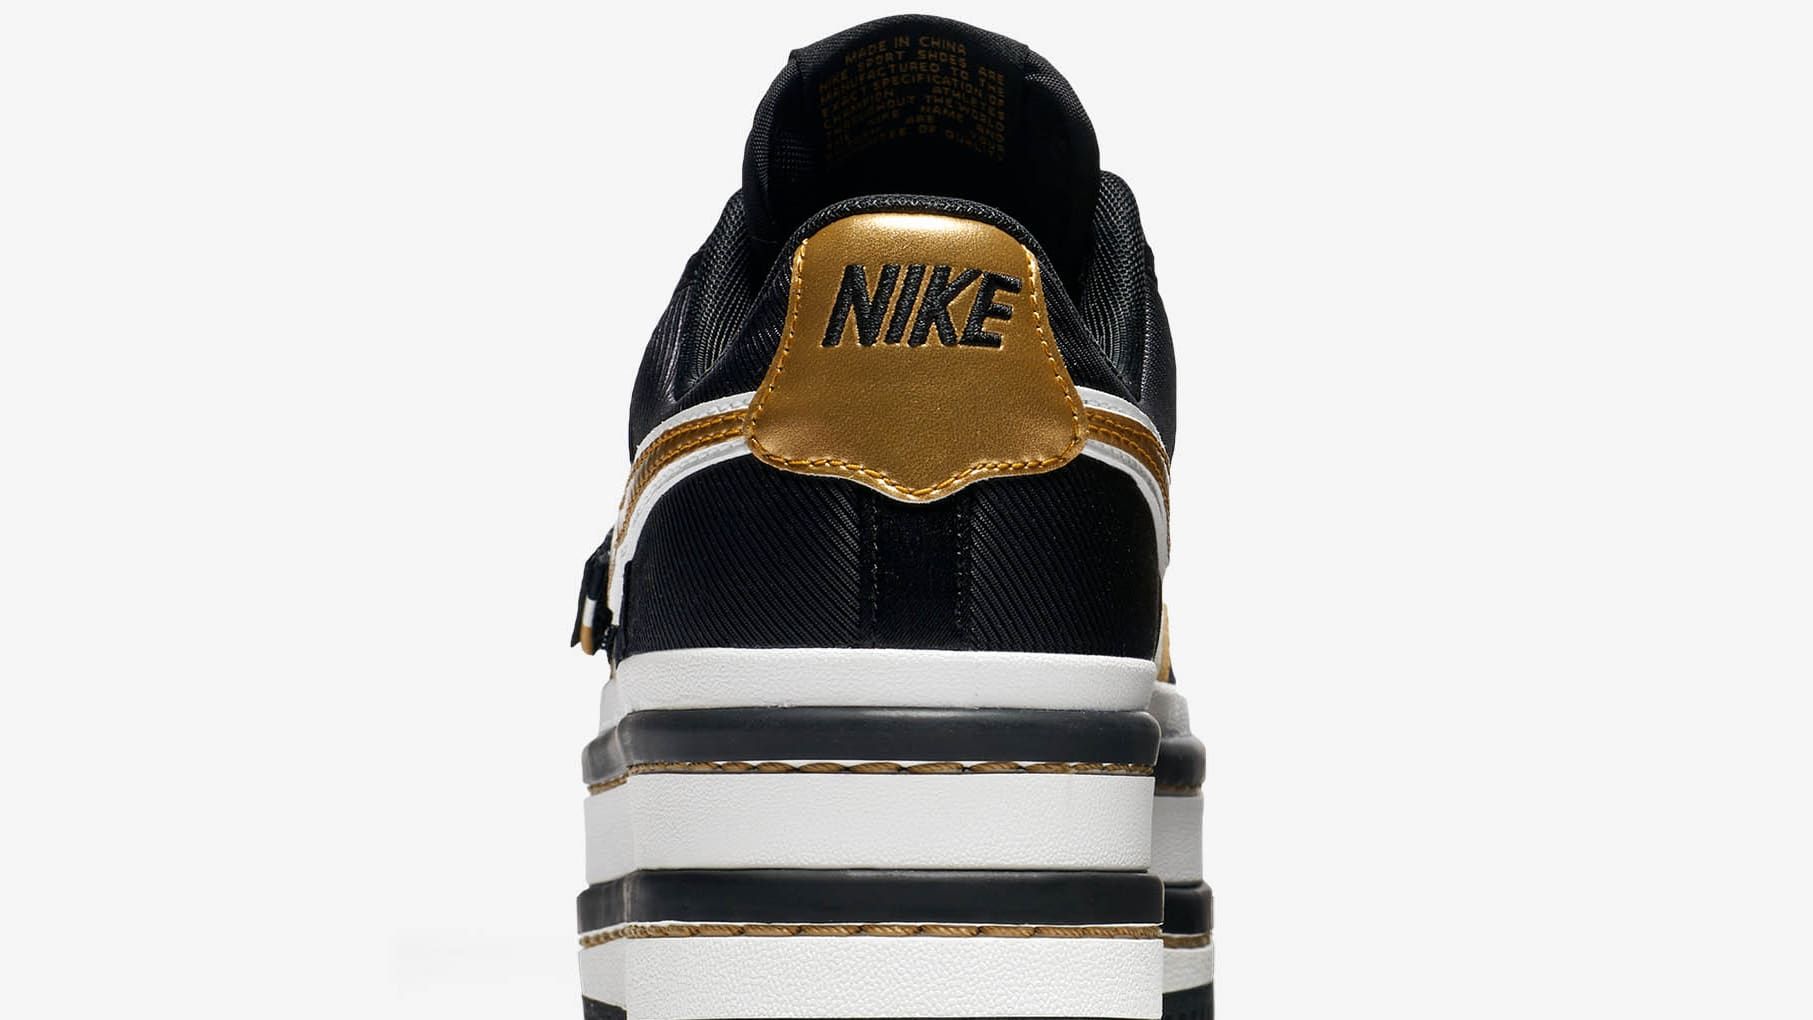 0619f9da5689 Image via Nike nike vandal 2k  black gold